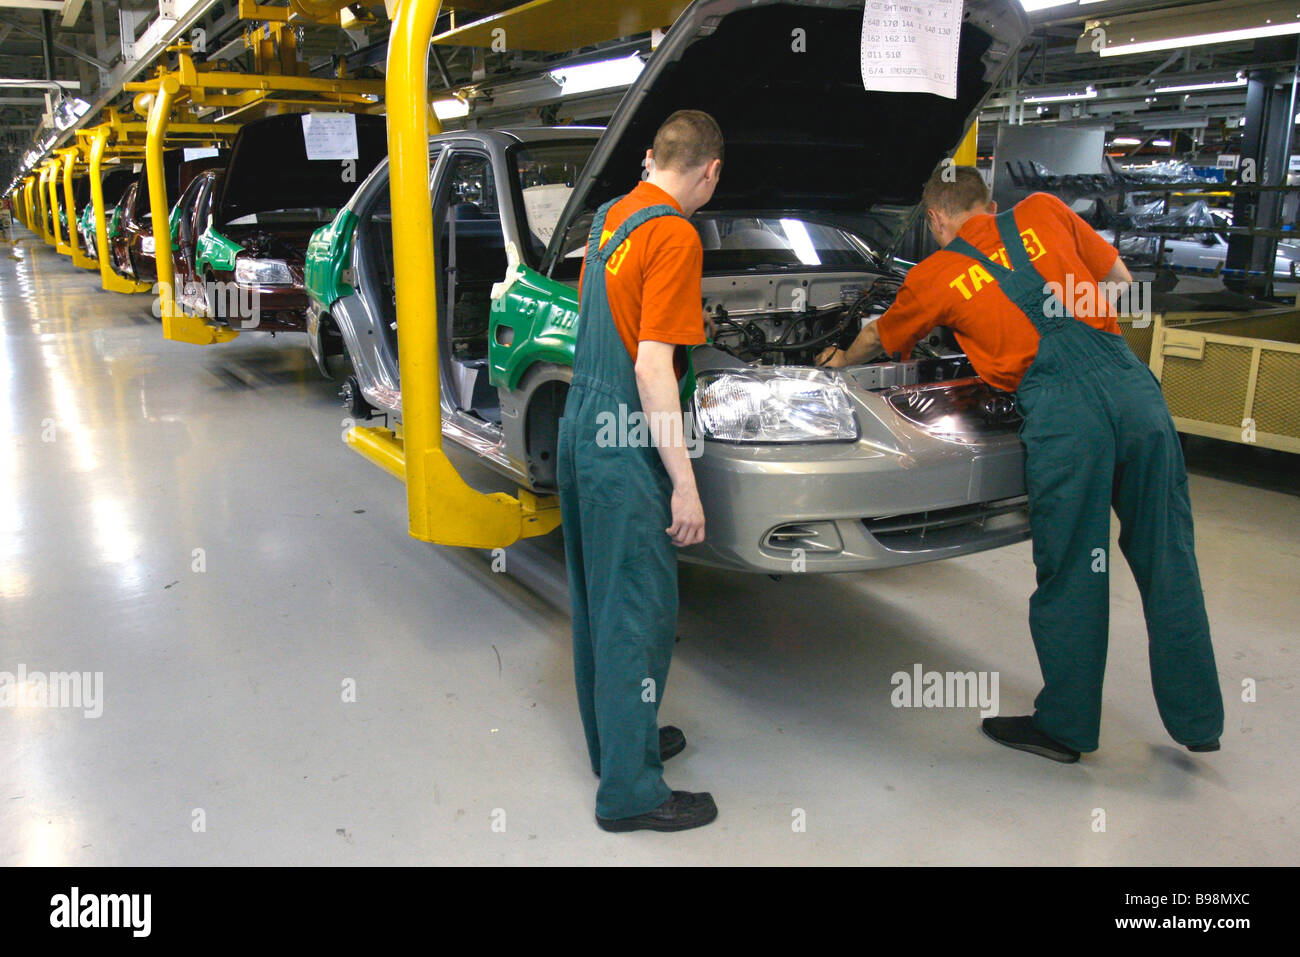 A shop at the Taganrog car manufacturing plant where Korean jeeps Hyundai Santa Fe Classic are produced - Stock Image